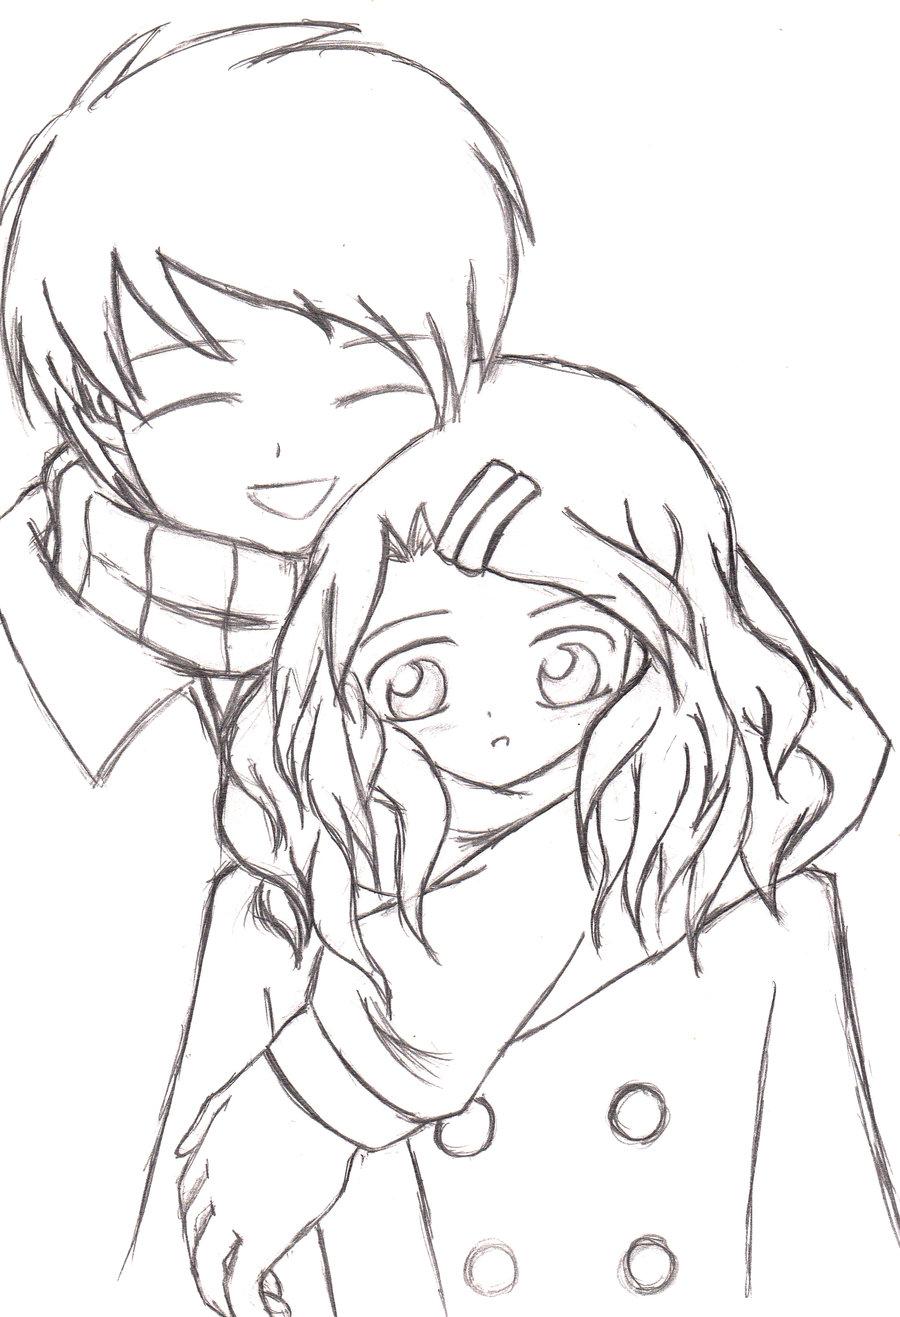 900x1317 A Heartwarming Hug (Sketch 2008) By Keymace101